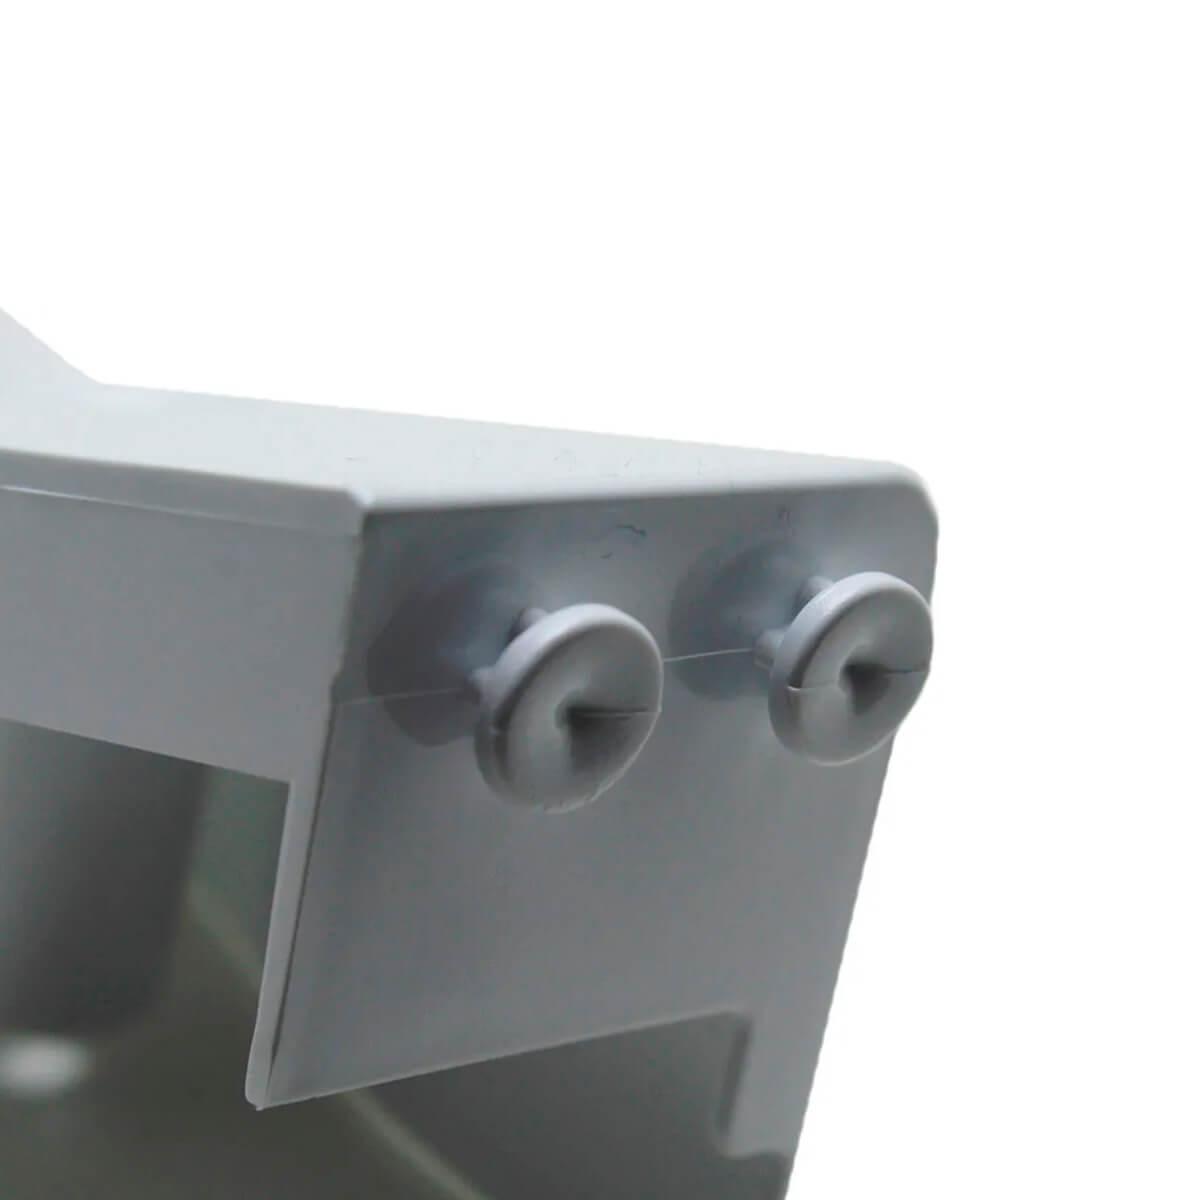 Caixa Traseira De Controles Para Refrigerador Electrolux SS75X SS75 SS76X SS77X - 41608901